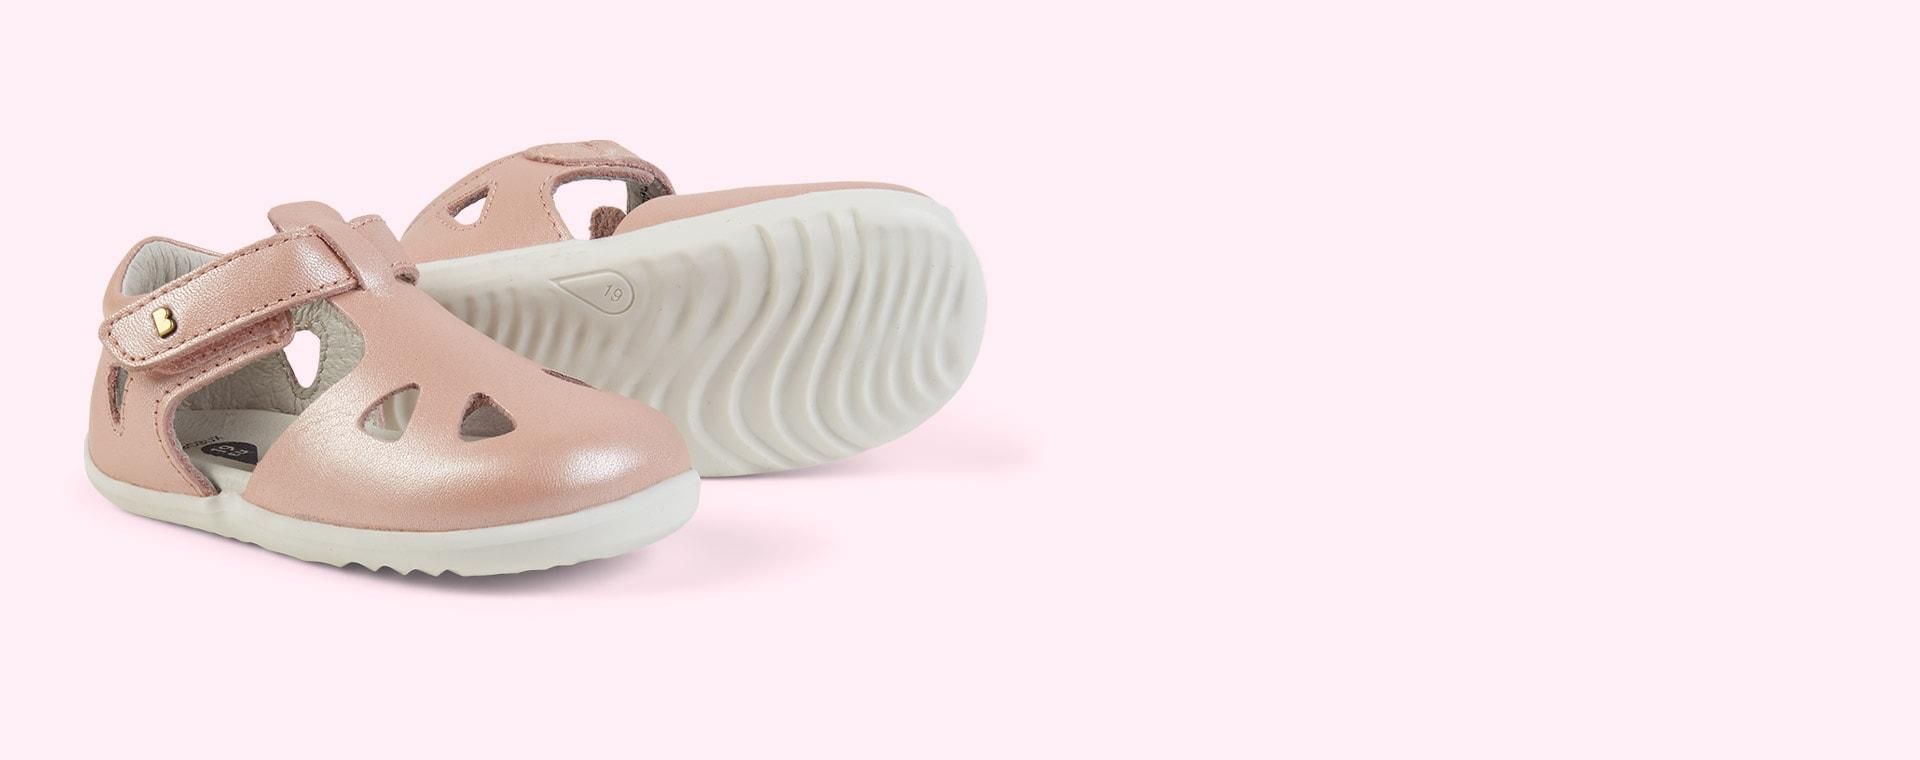 Seashell Bobux Step Up Classic Zap Sandal